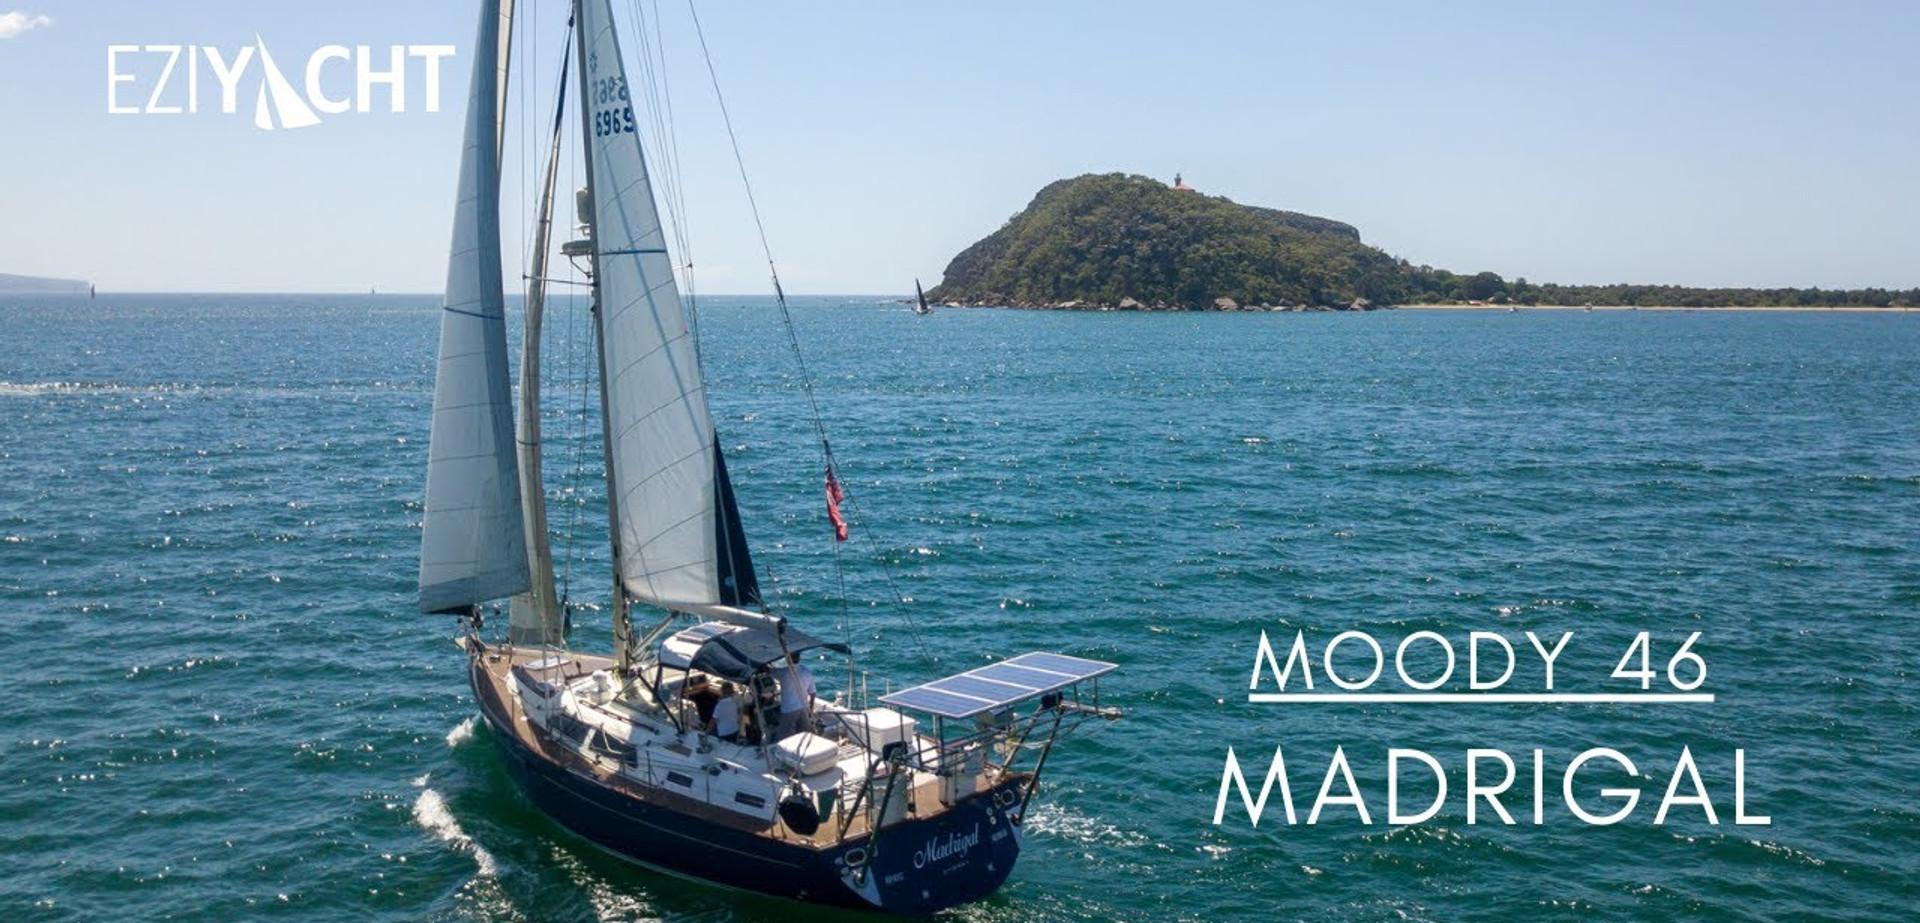 Moody 46 Madrigal sailing video Broken Bay